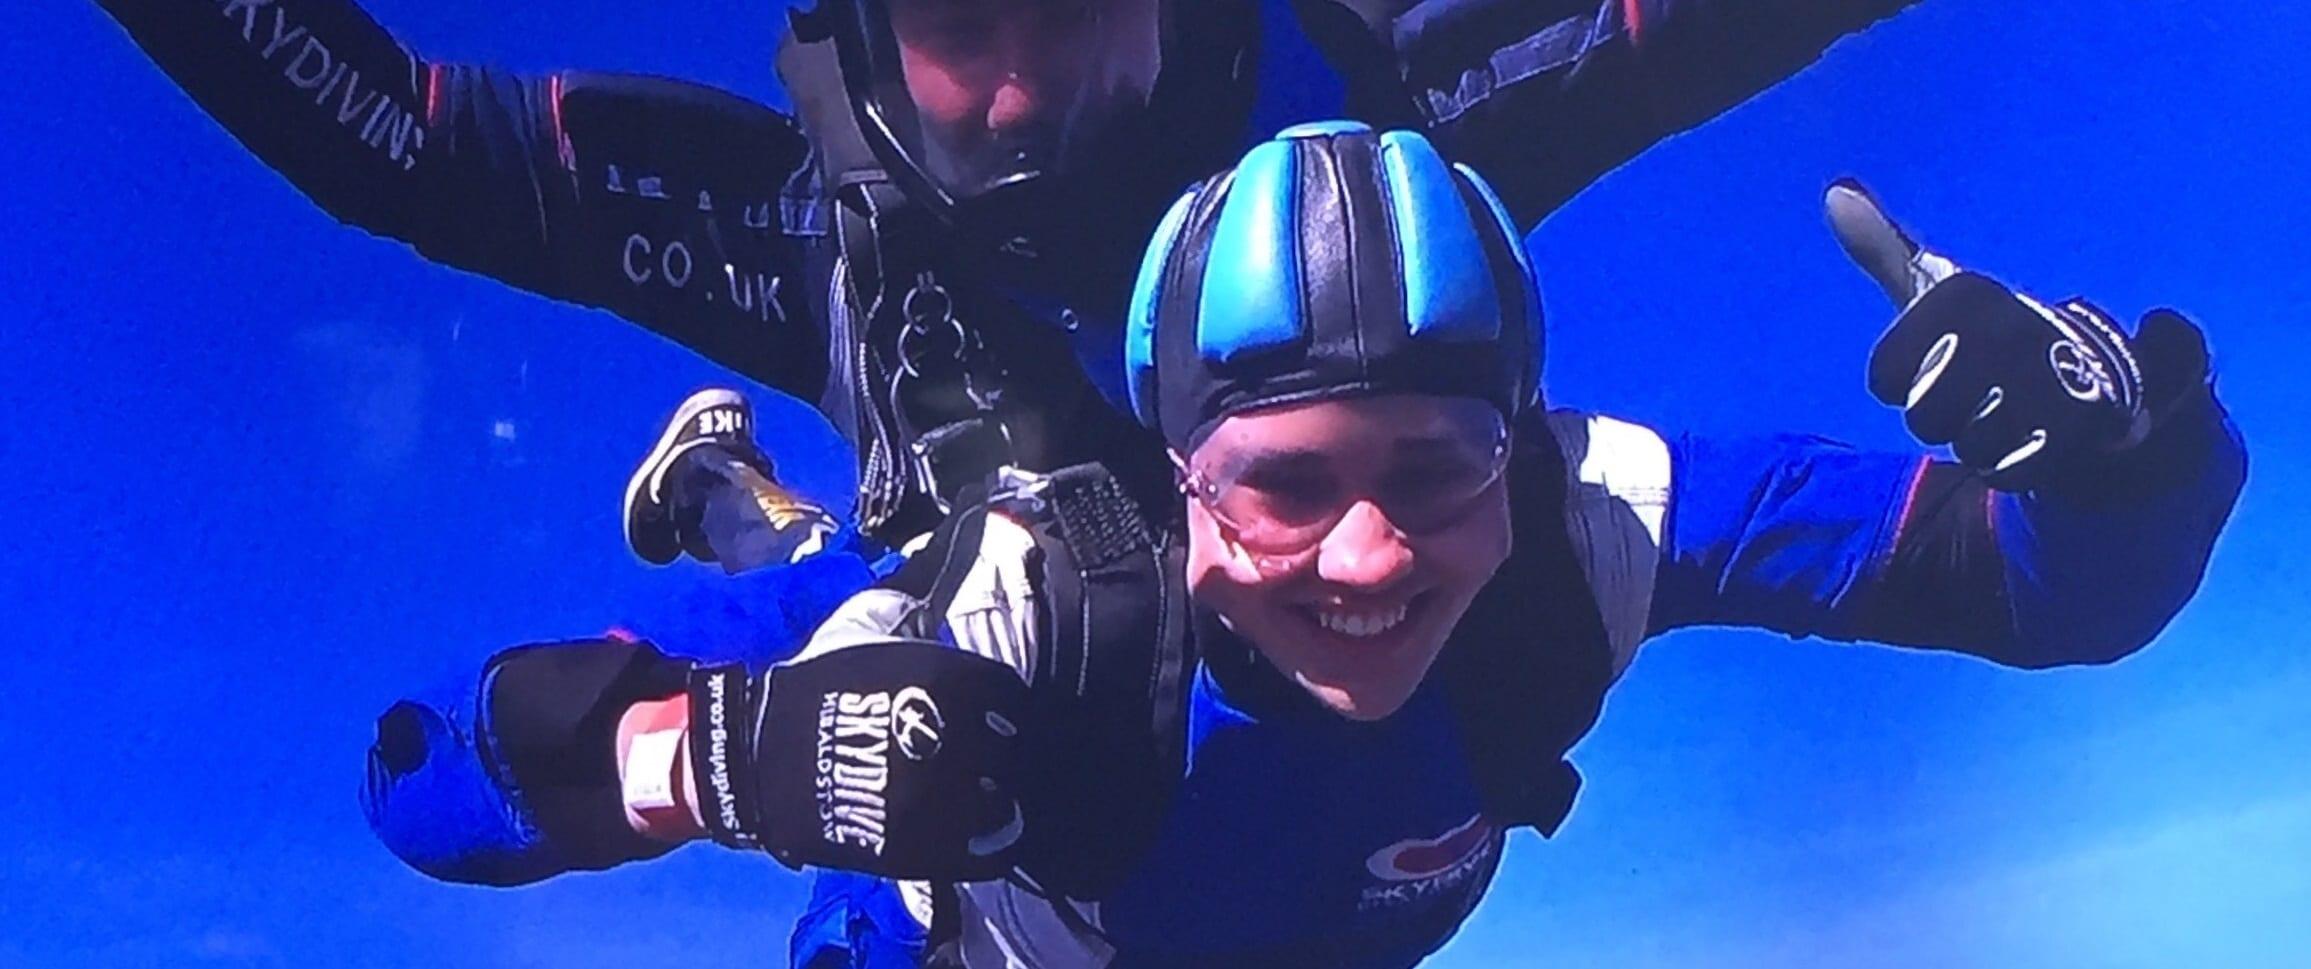 Charlie's skydive...